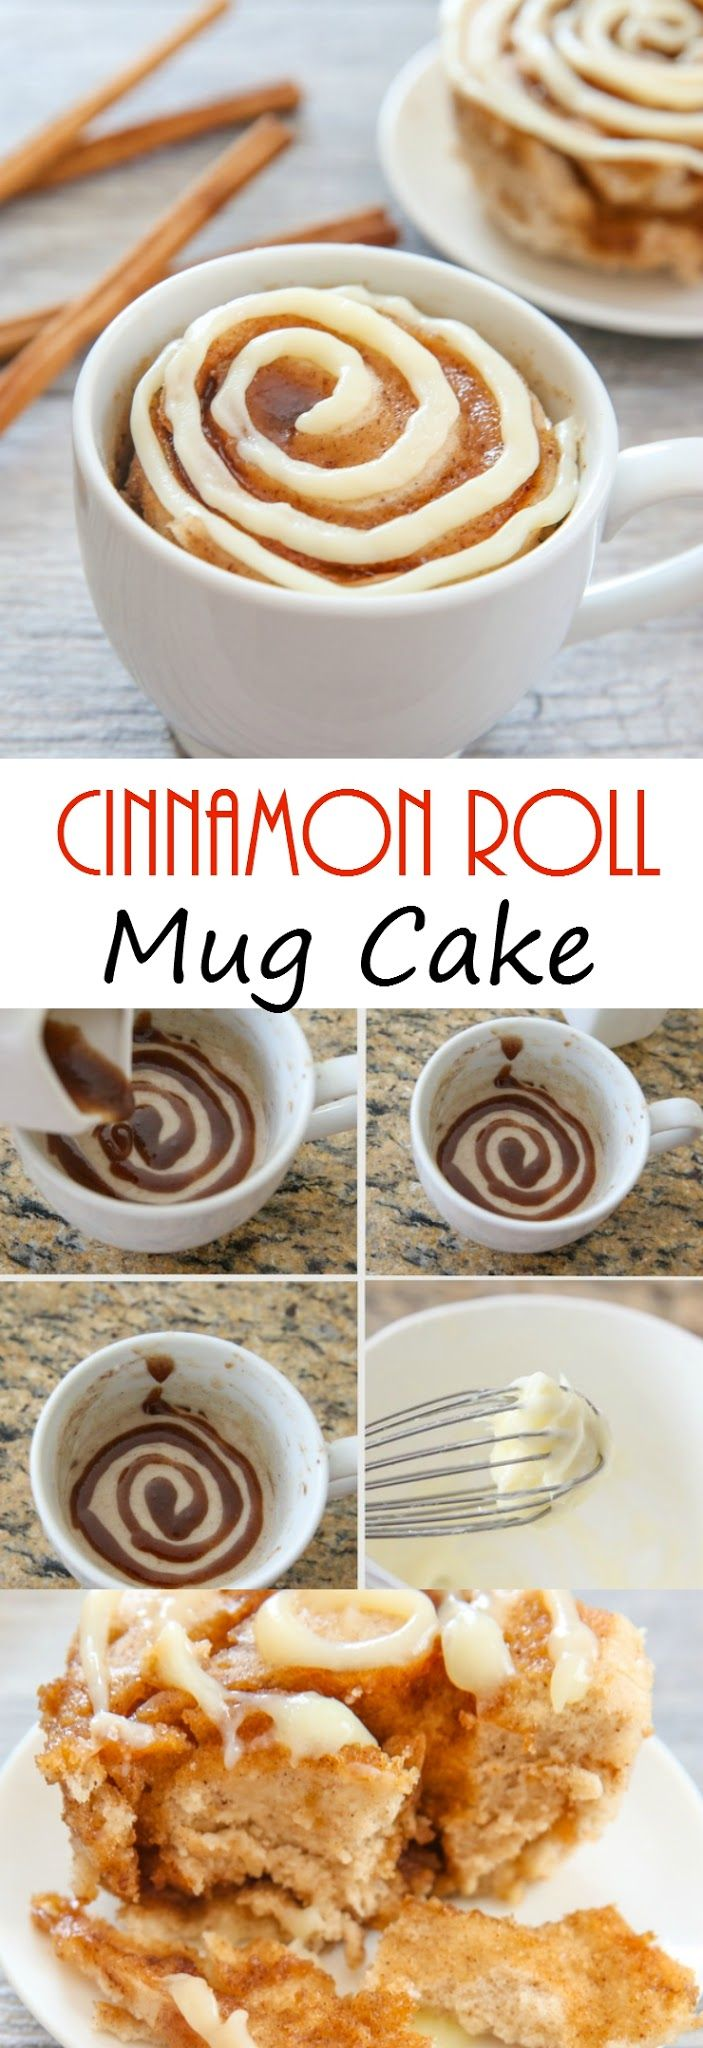 Zimtrollen Tassenkuchen // Cinnamon roll mug cake #backen #baking #Bahlsen #LifeIsSweet #SweetTrends